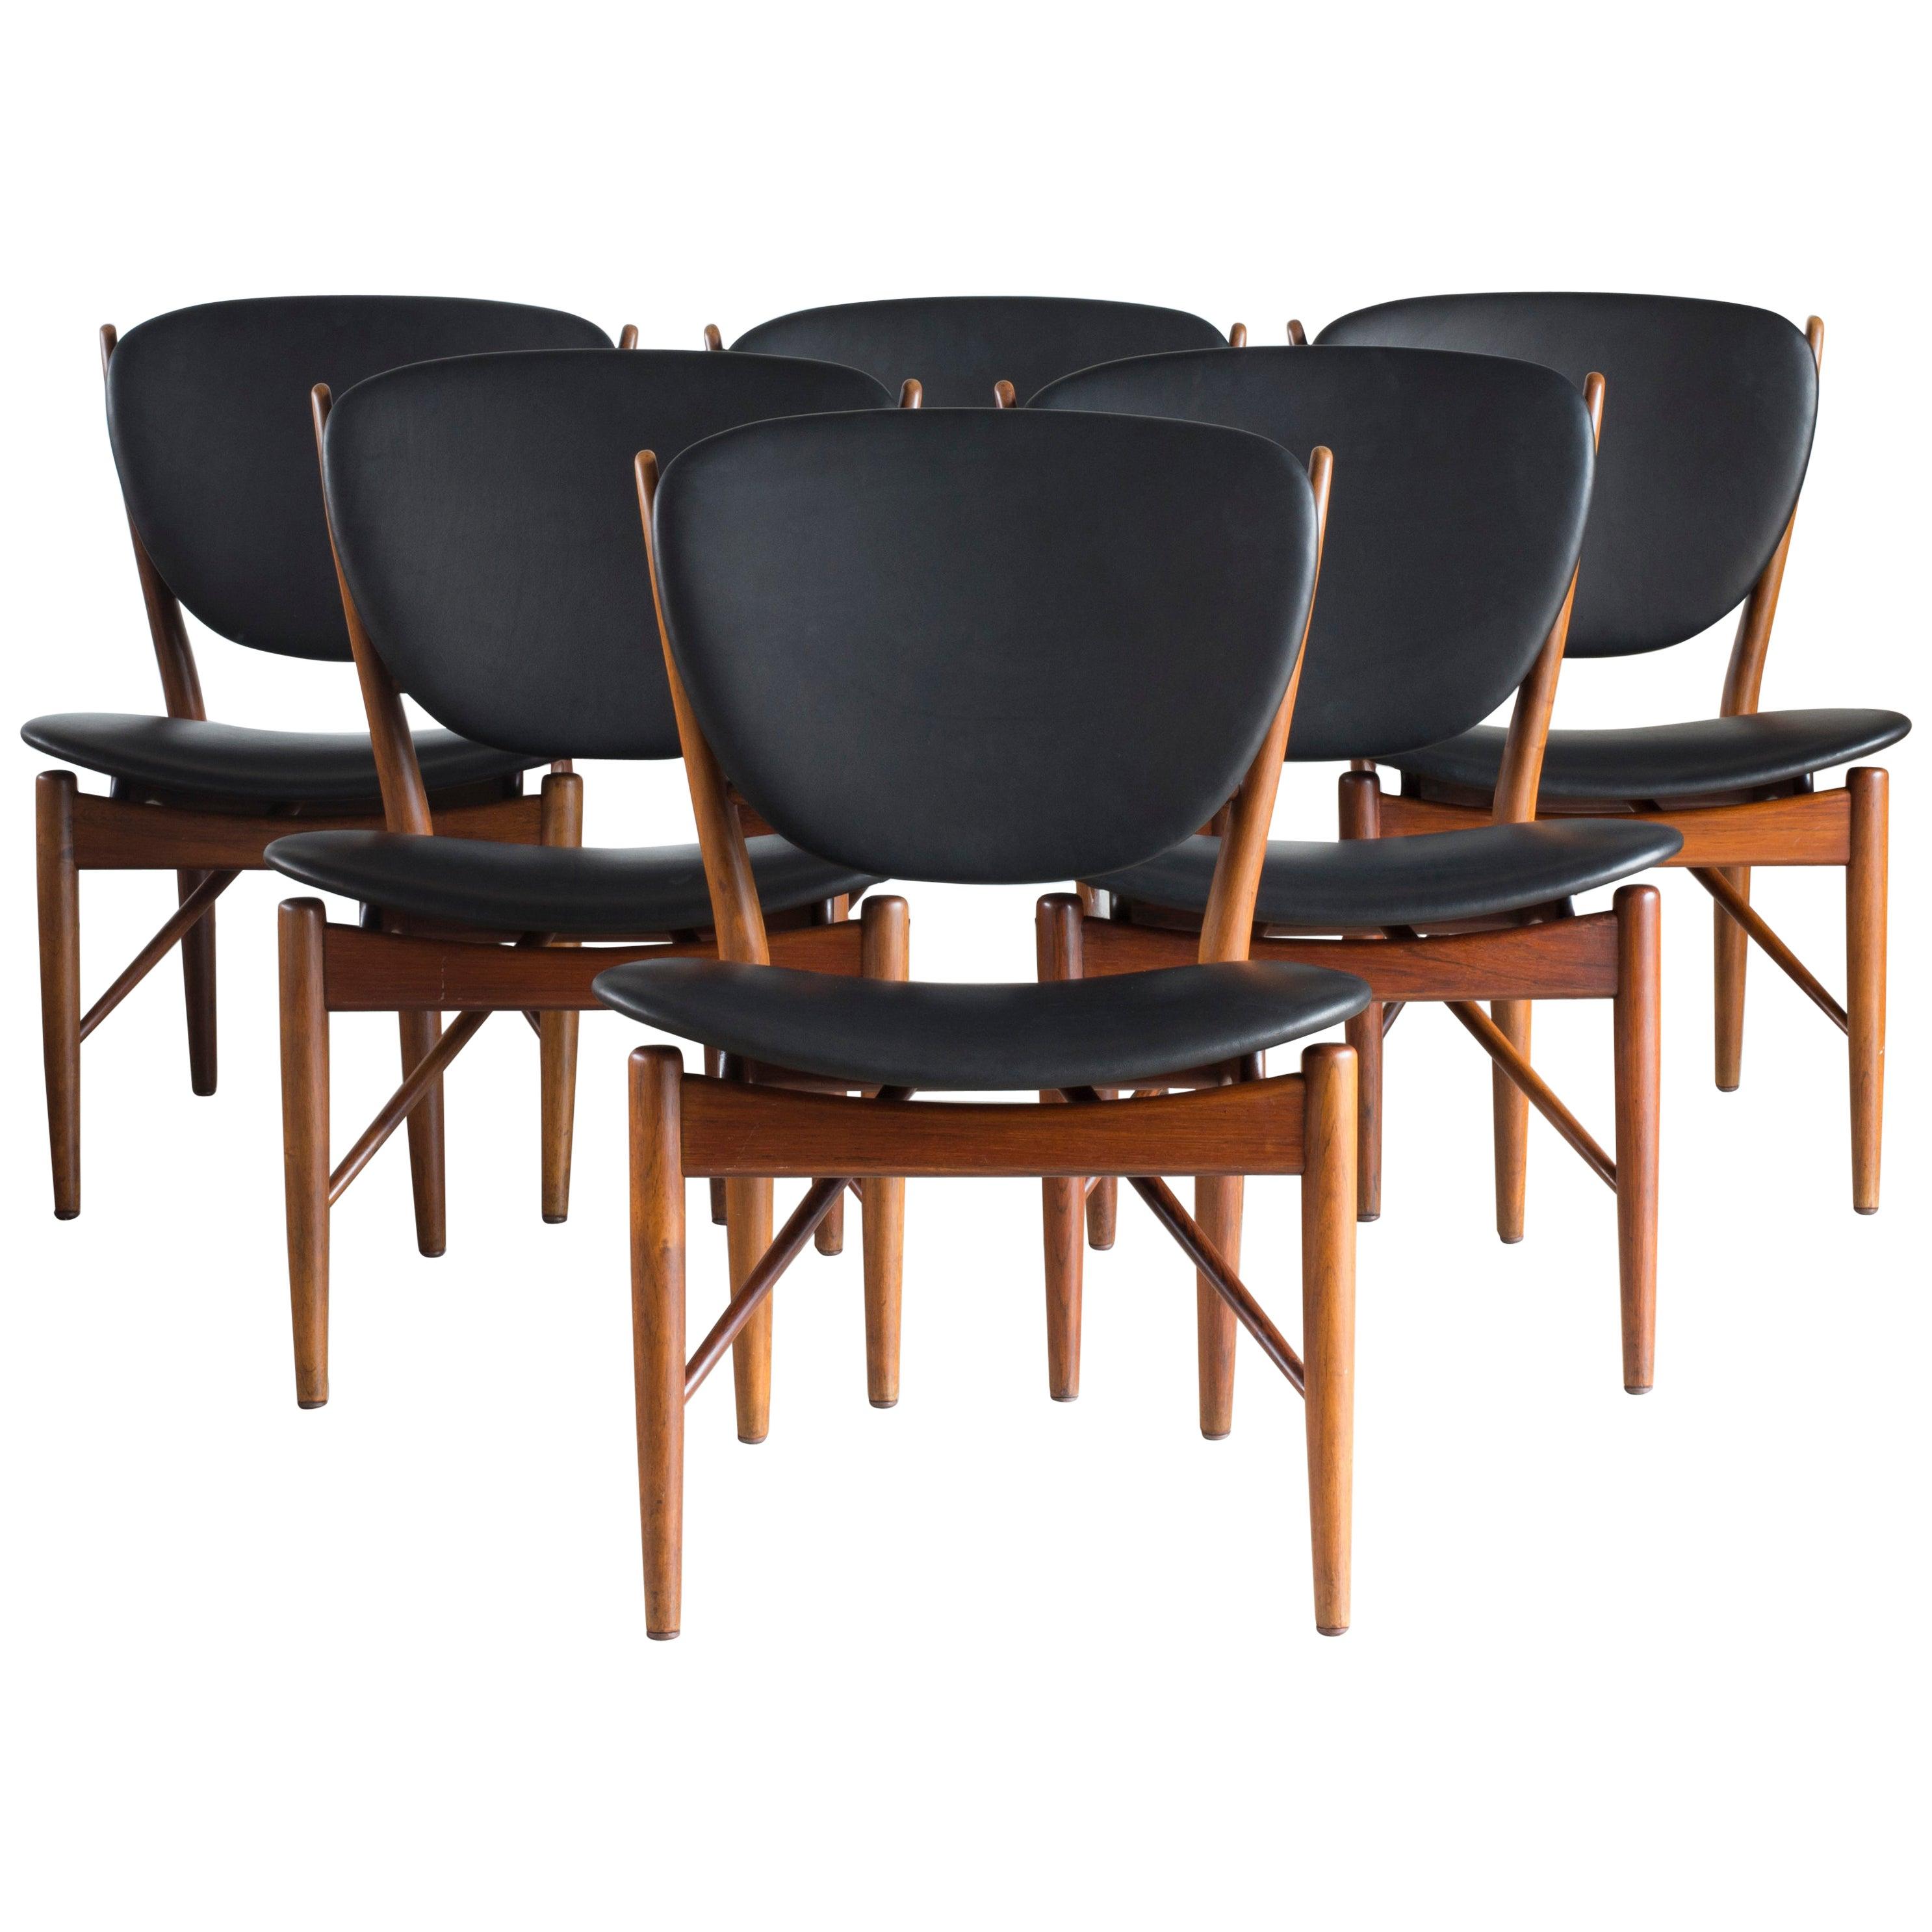 Finn Juhl Set of Six Chairs for Niels Vodder